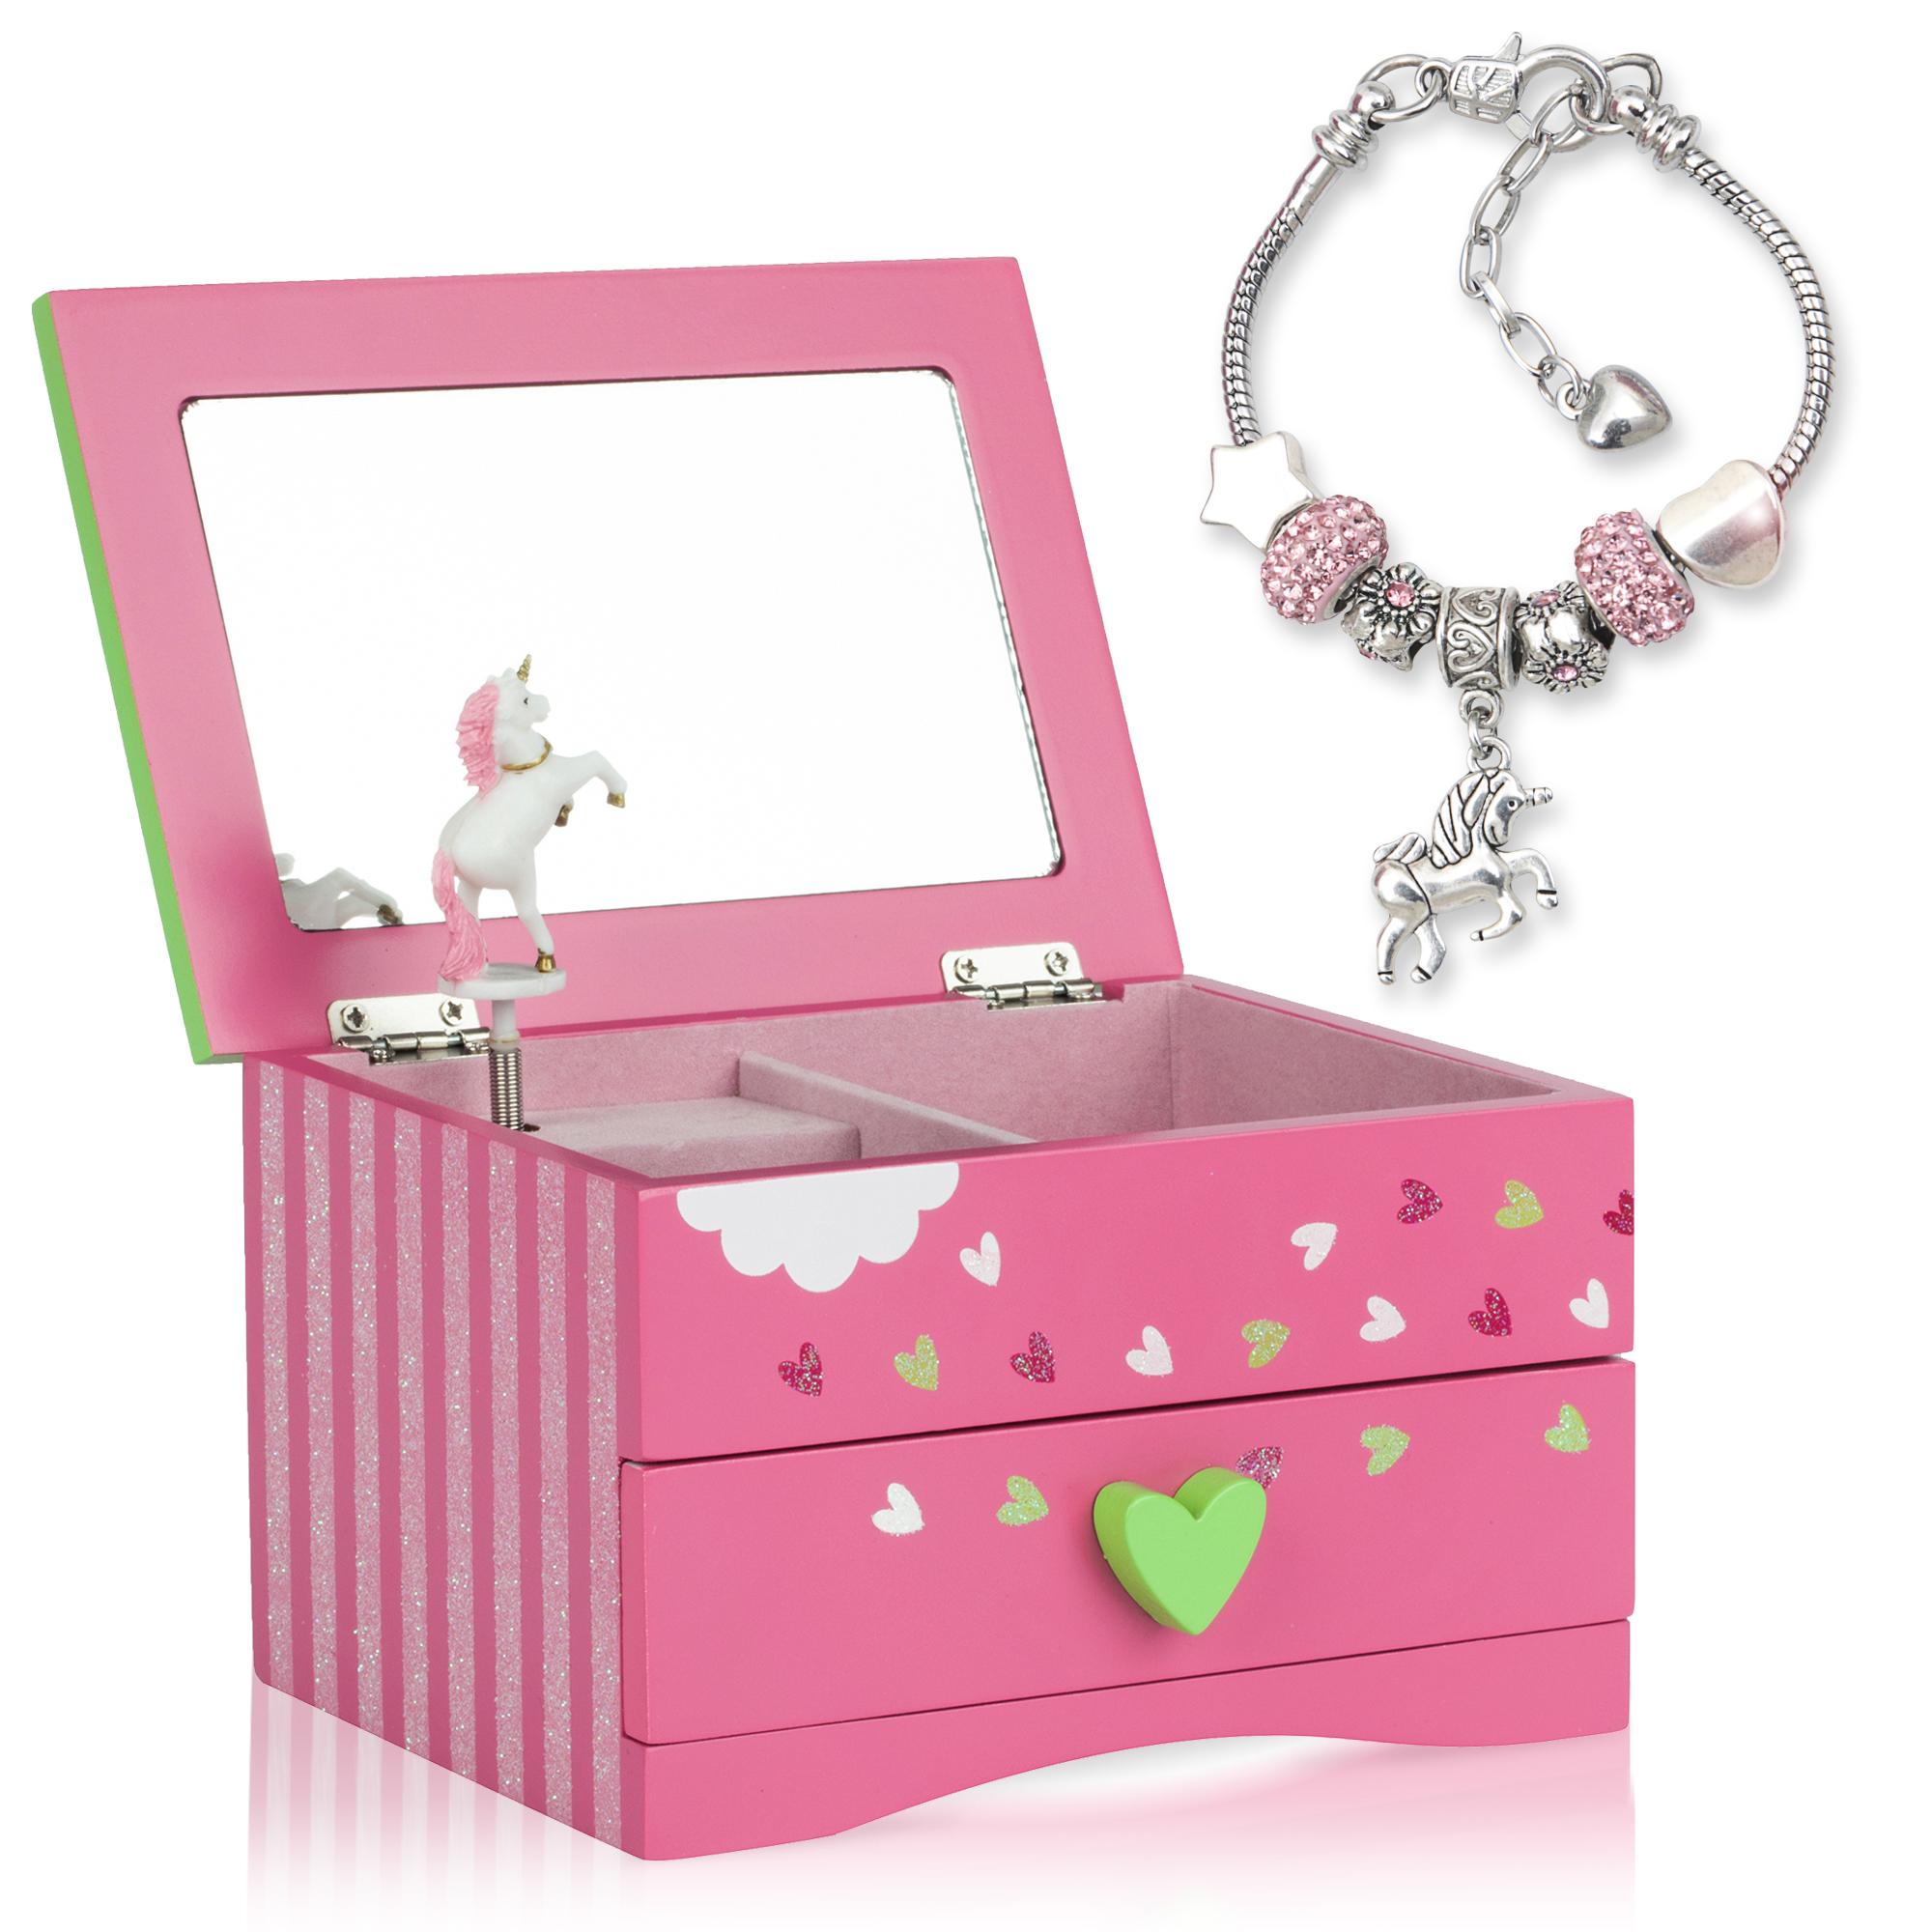 Unicorn Musical Jewelry Box - Fuchsia and Green with Unicorn Charm Bracelet